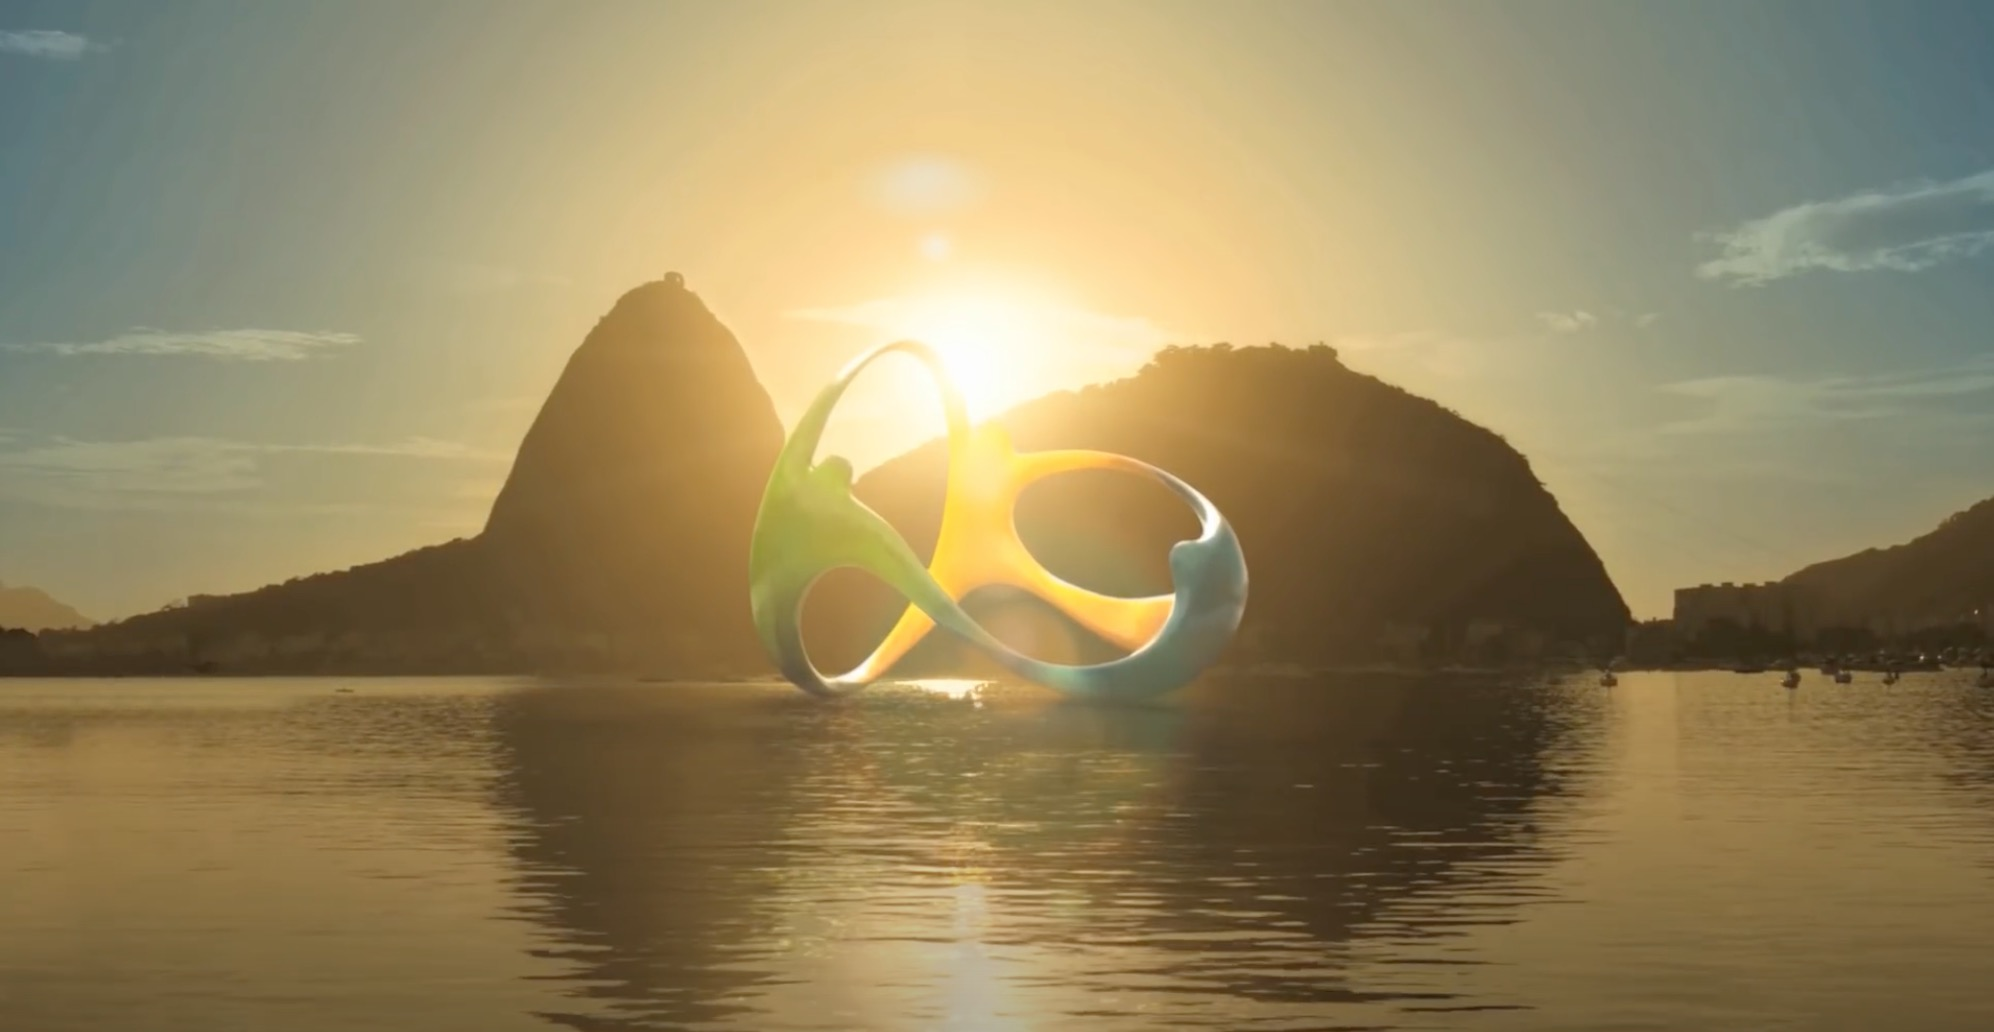 Cidades brasileiras se candidataram a receber os jogos olímpicos ao longo dos anos